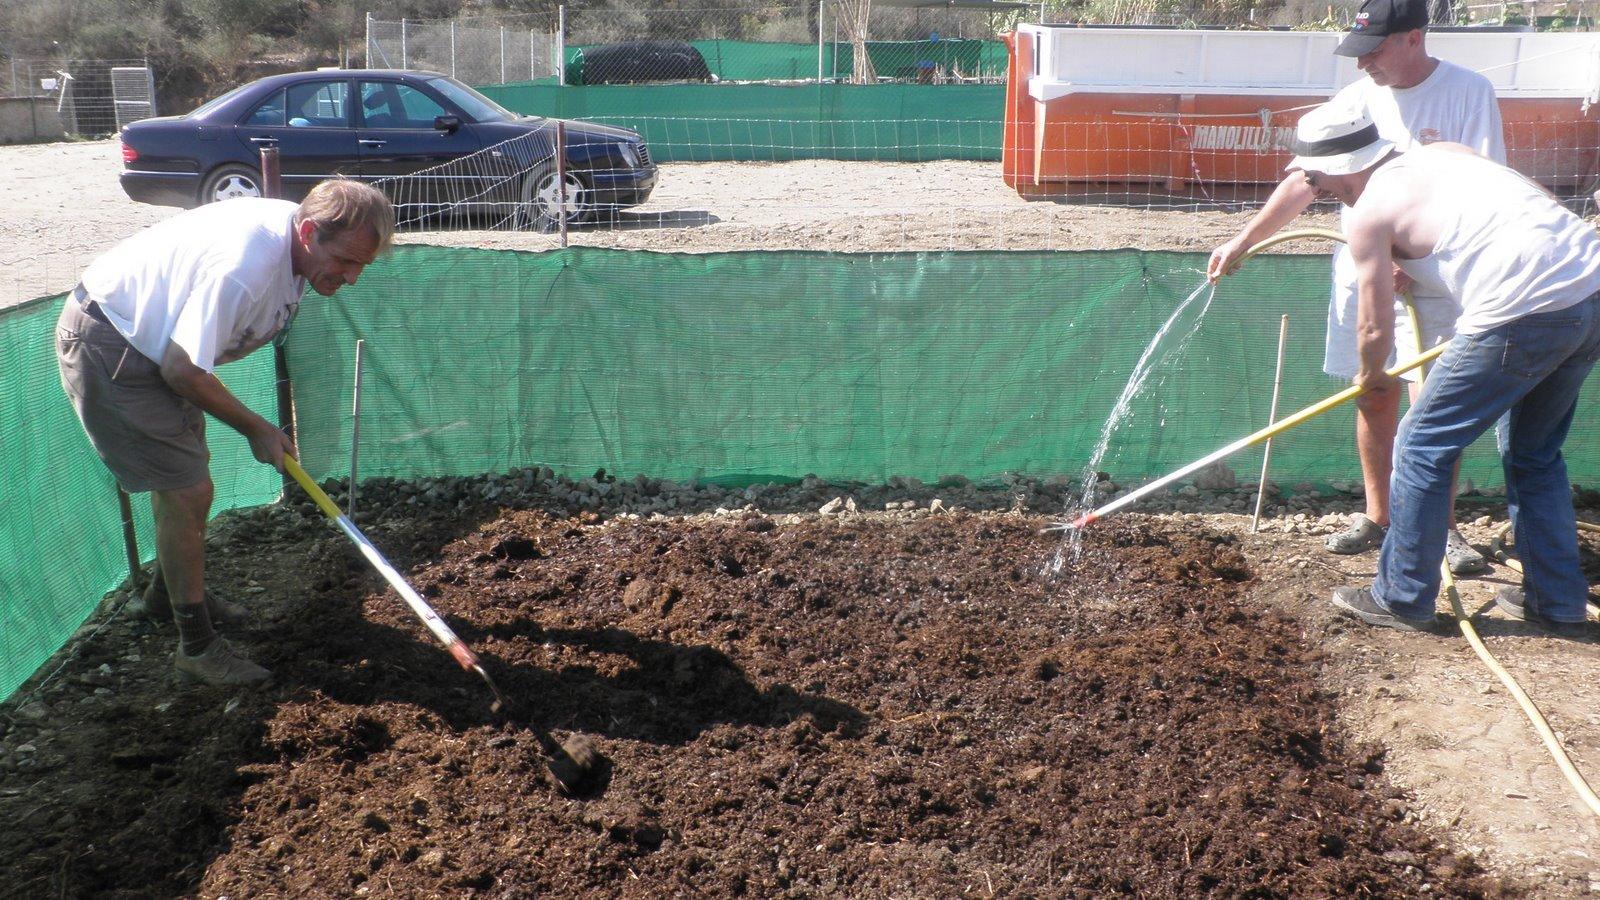 Huerto en casa siembra de berenjena obreros docentes - Preparacion de la tierra para sembrar ...